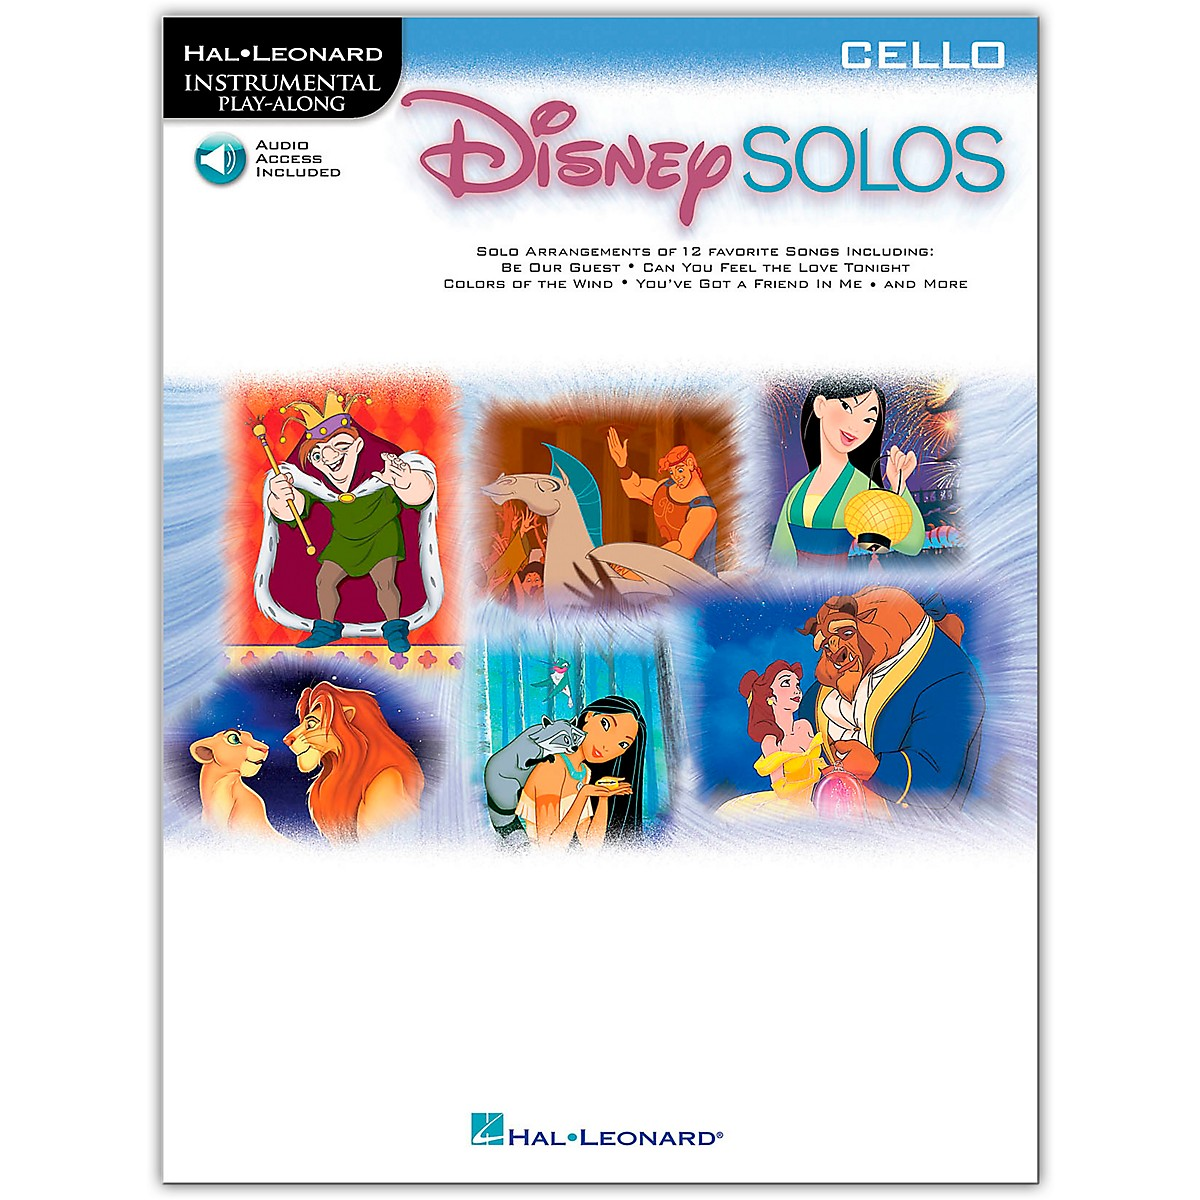 Hal Leonard Play-Along Disney Solos Book - Cello (Book/Online Audio)